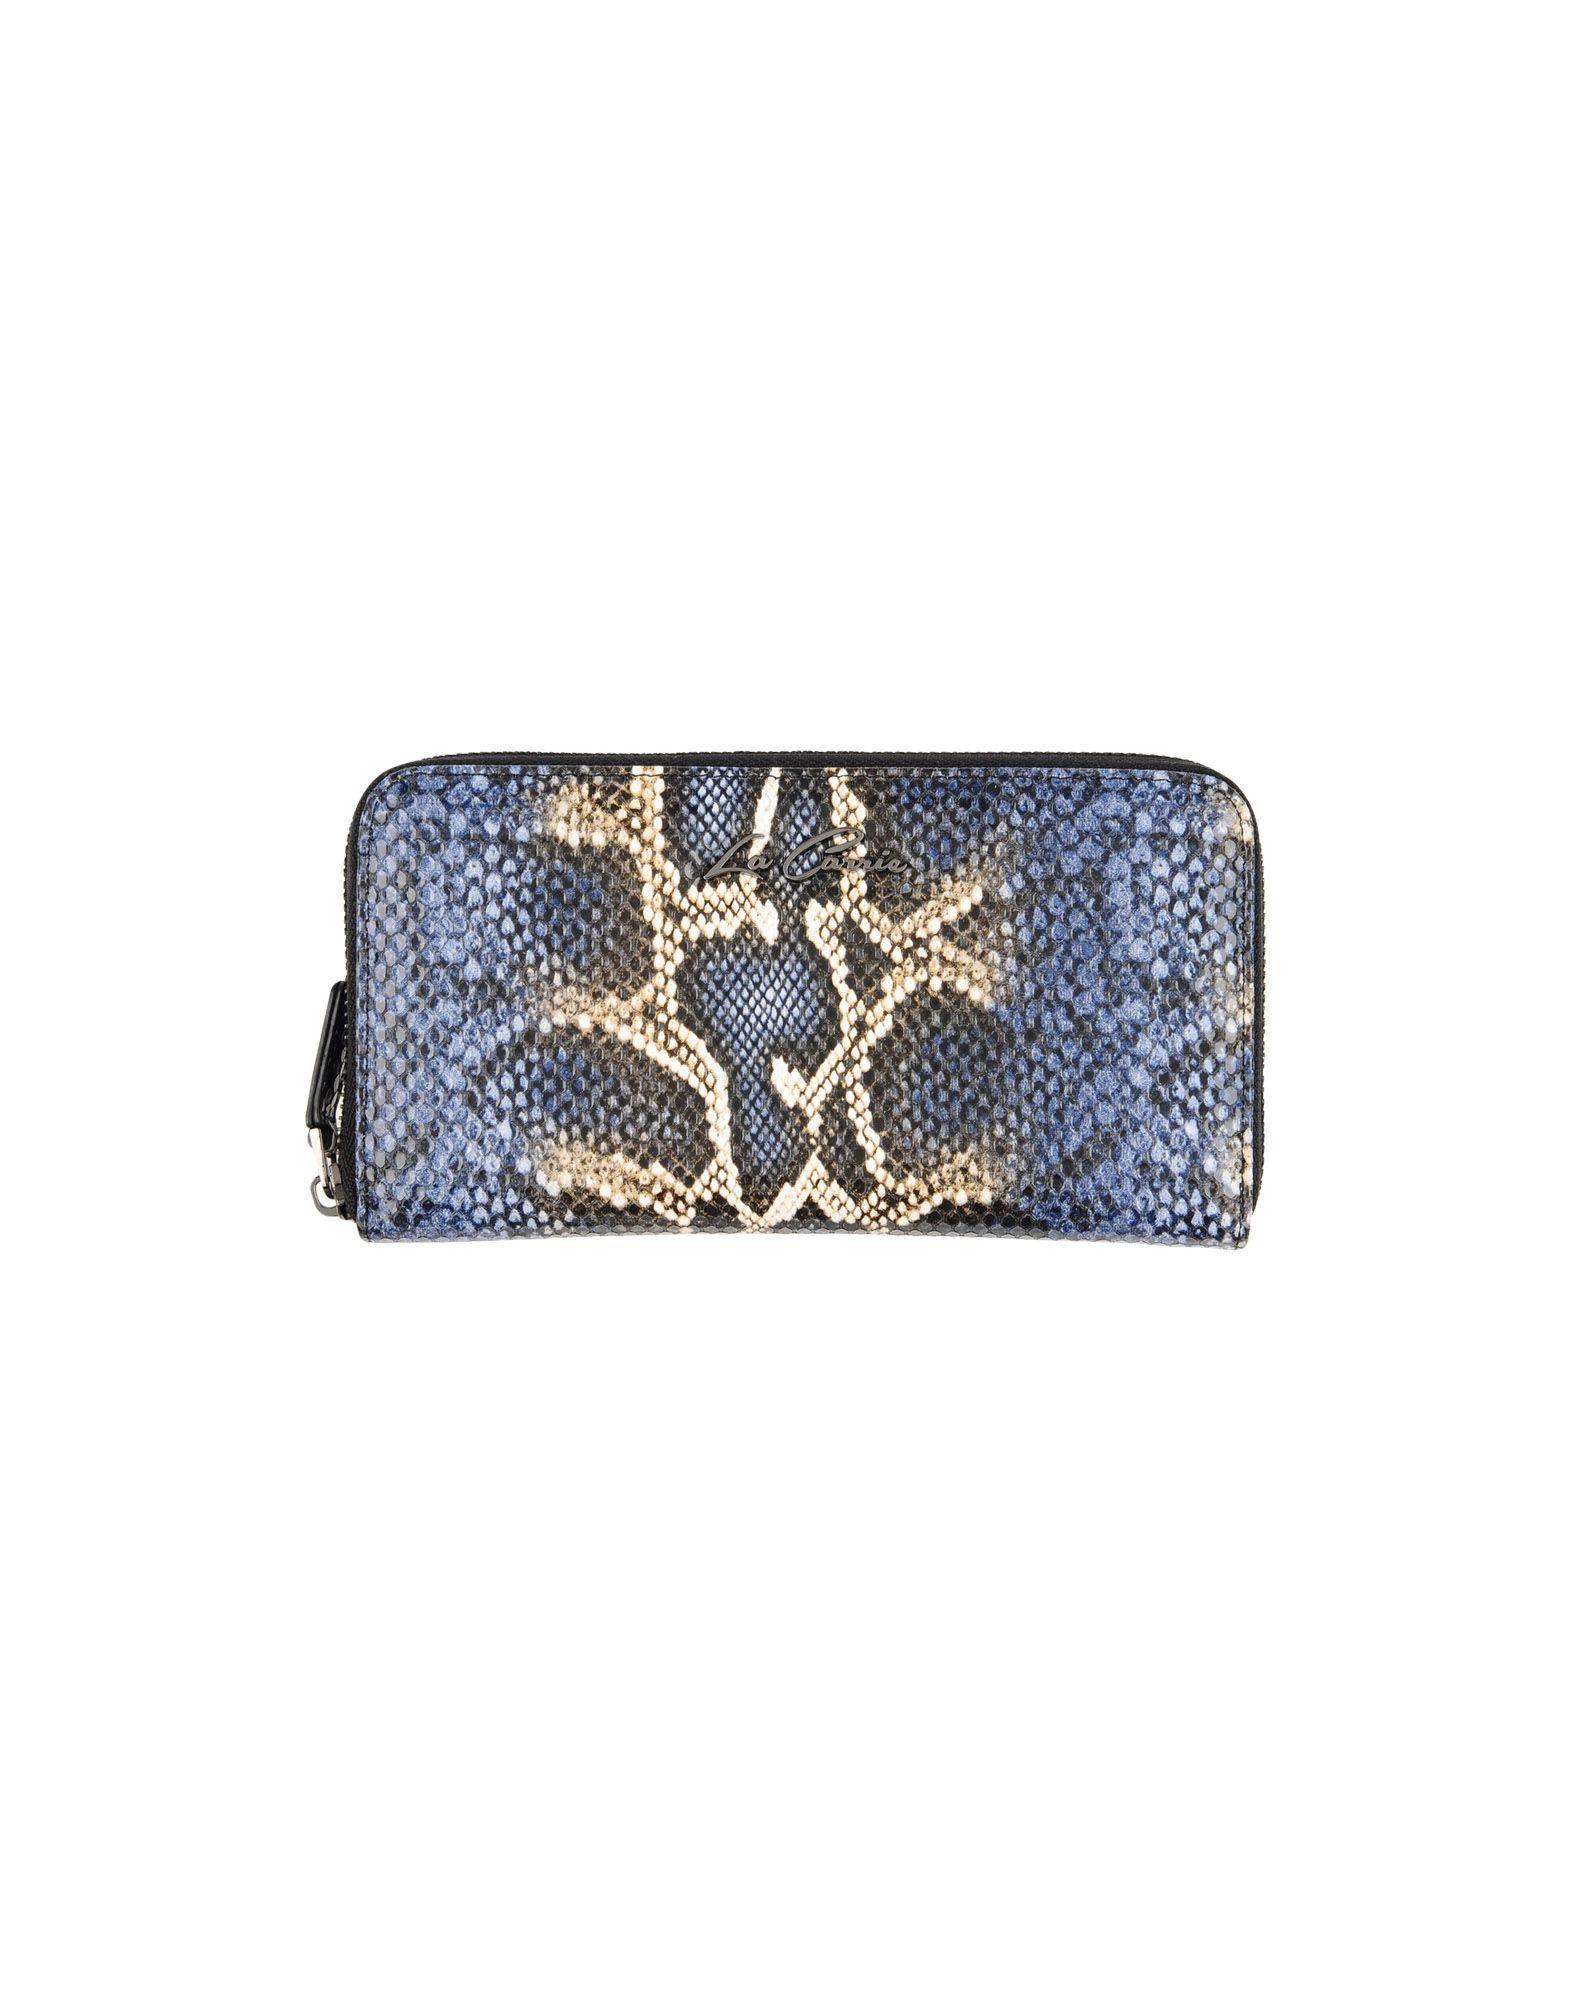 LA CARRIE BAG Damen Brieftasche Farbe Dunkelblau Größe 1